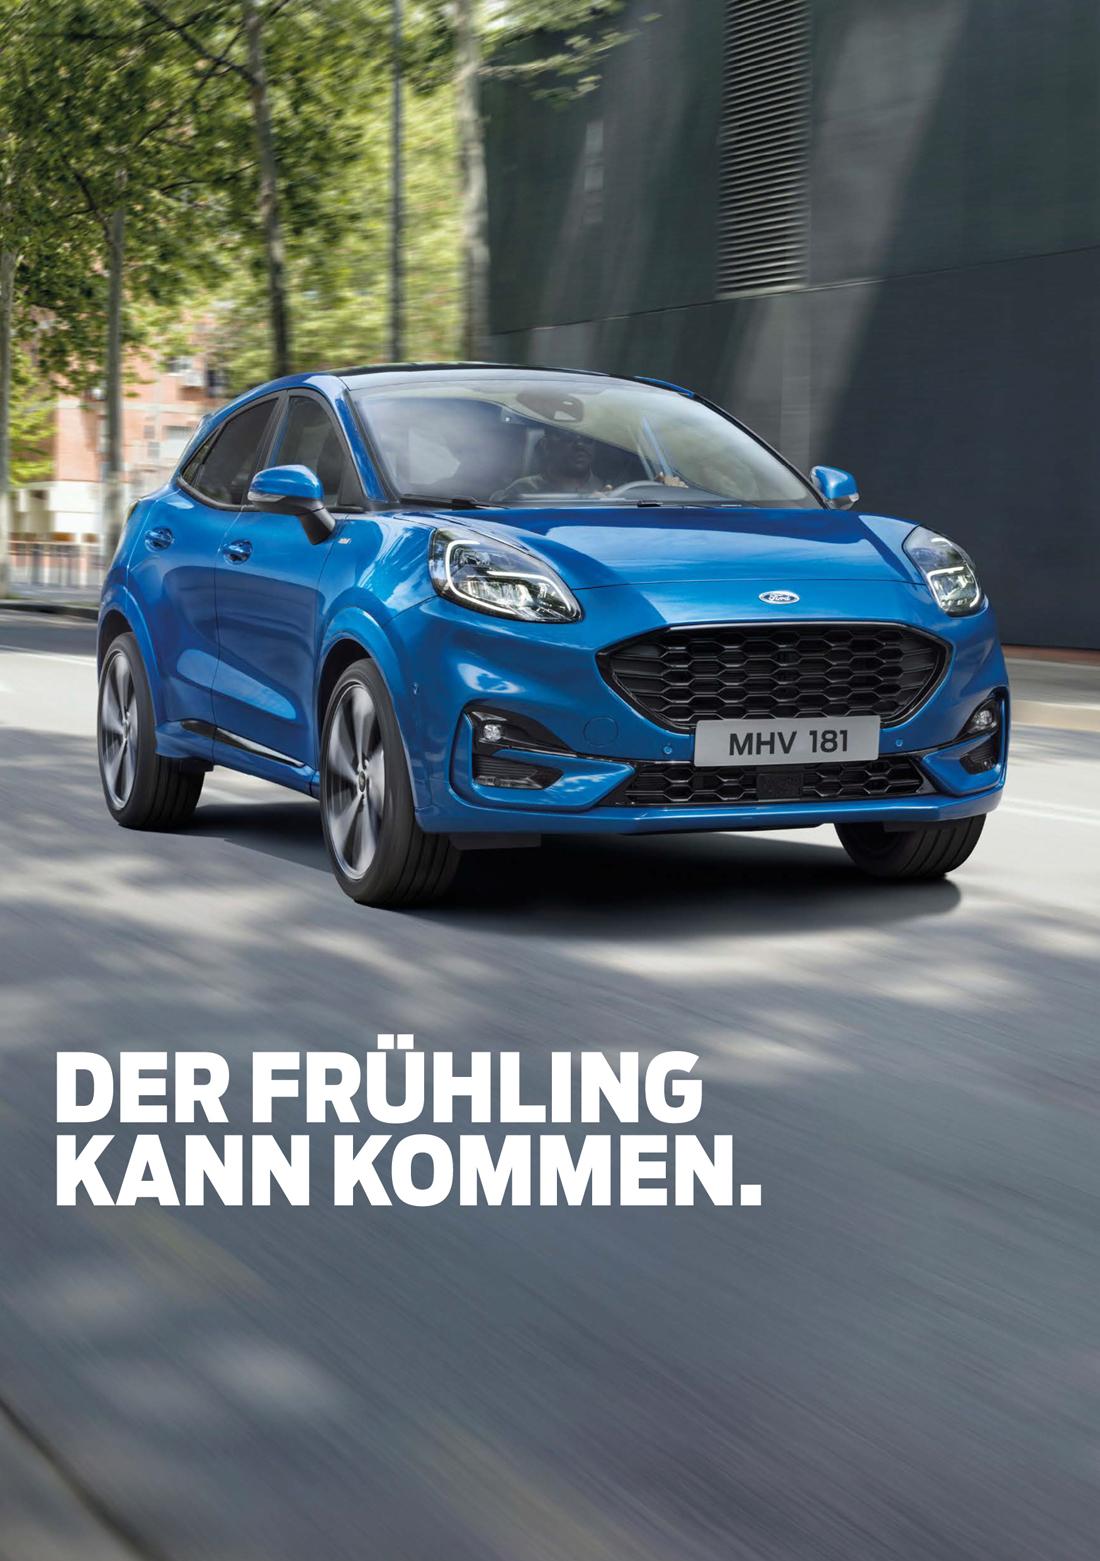 2021-Ford_Fruehlingskampagne_Broschuere-Seite-6a-2021-03-02.jpg#asset:722